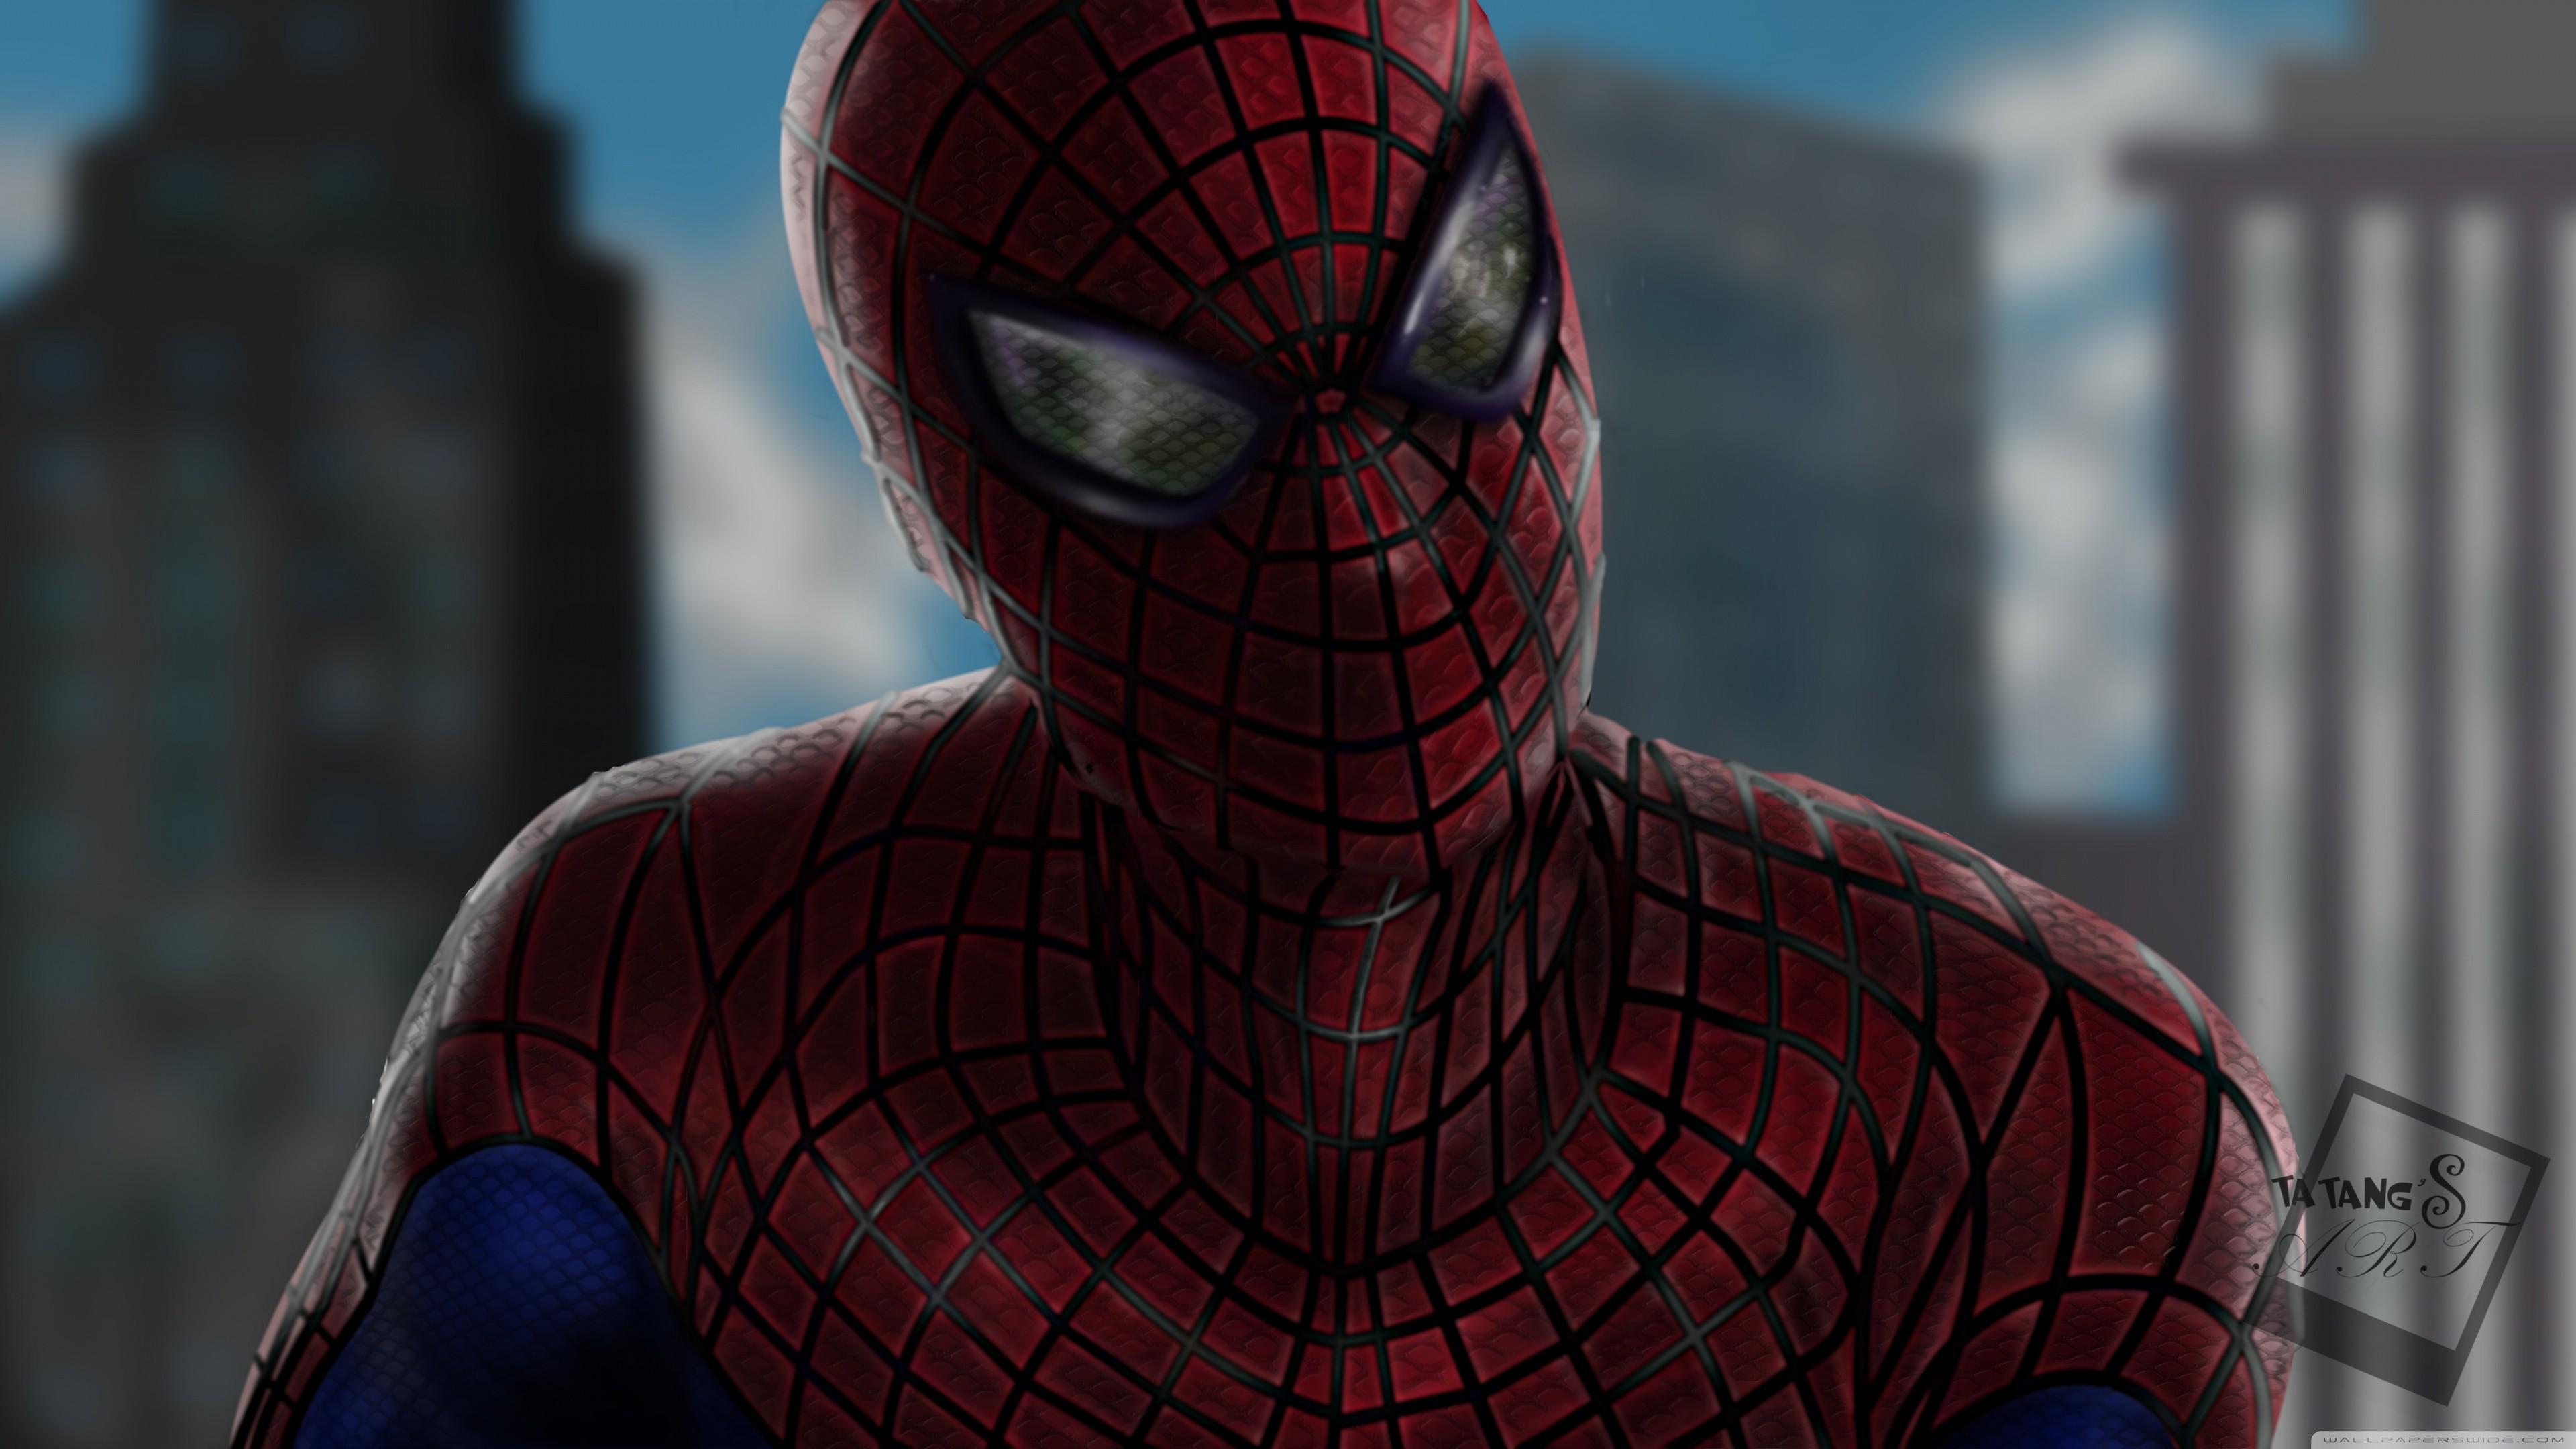 Ảnh The Amazing Spider Man